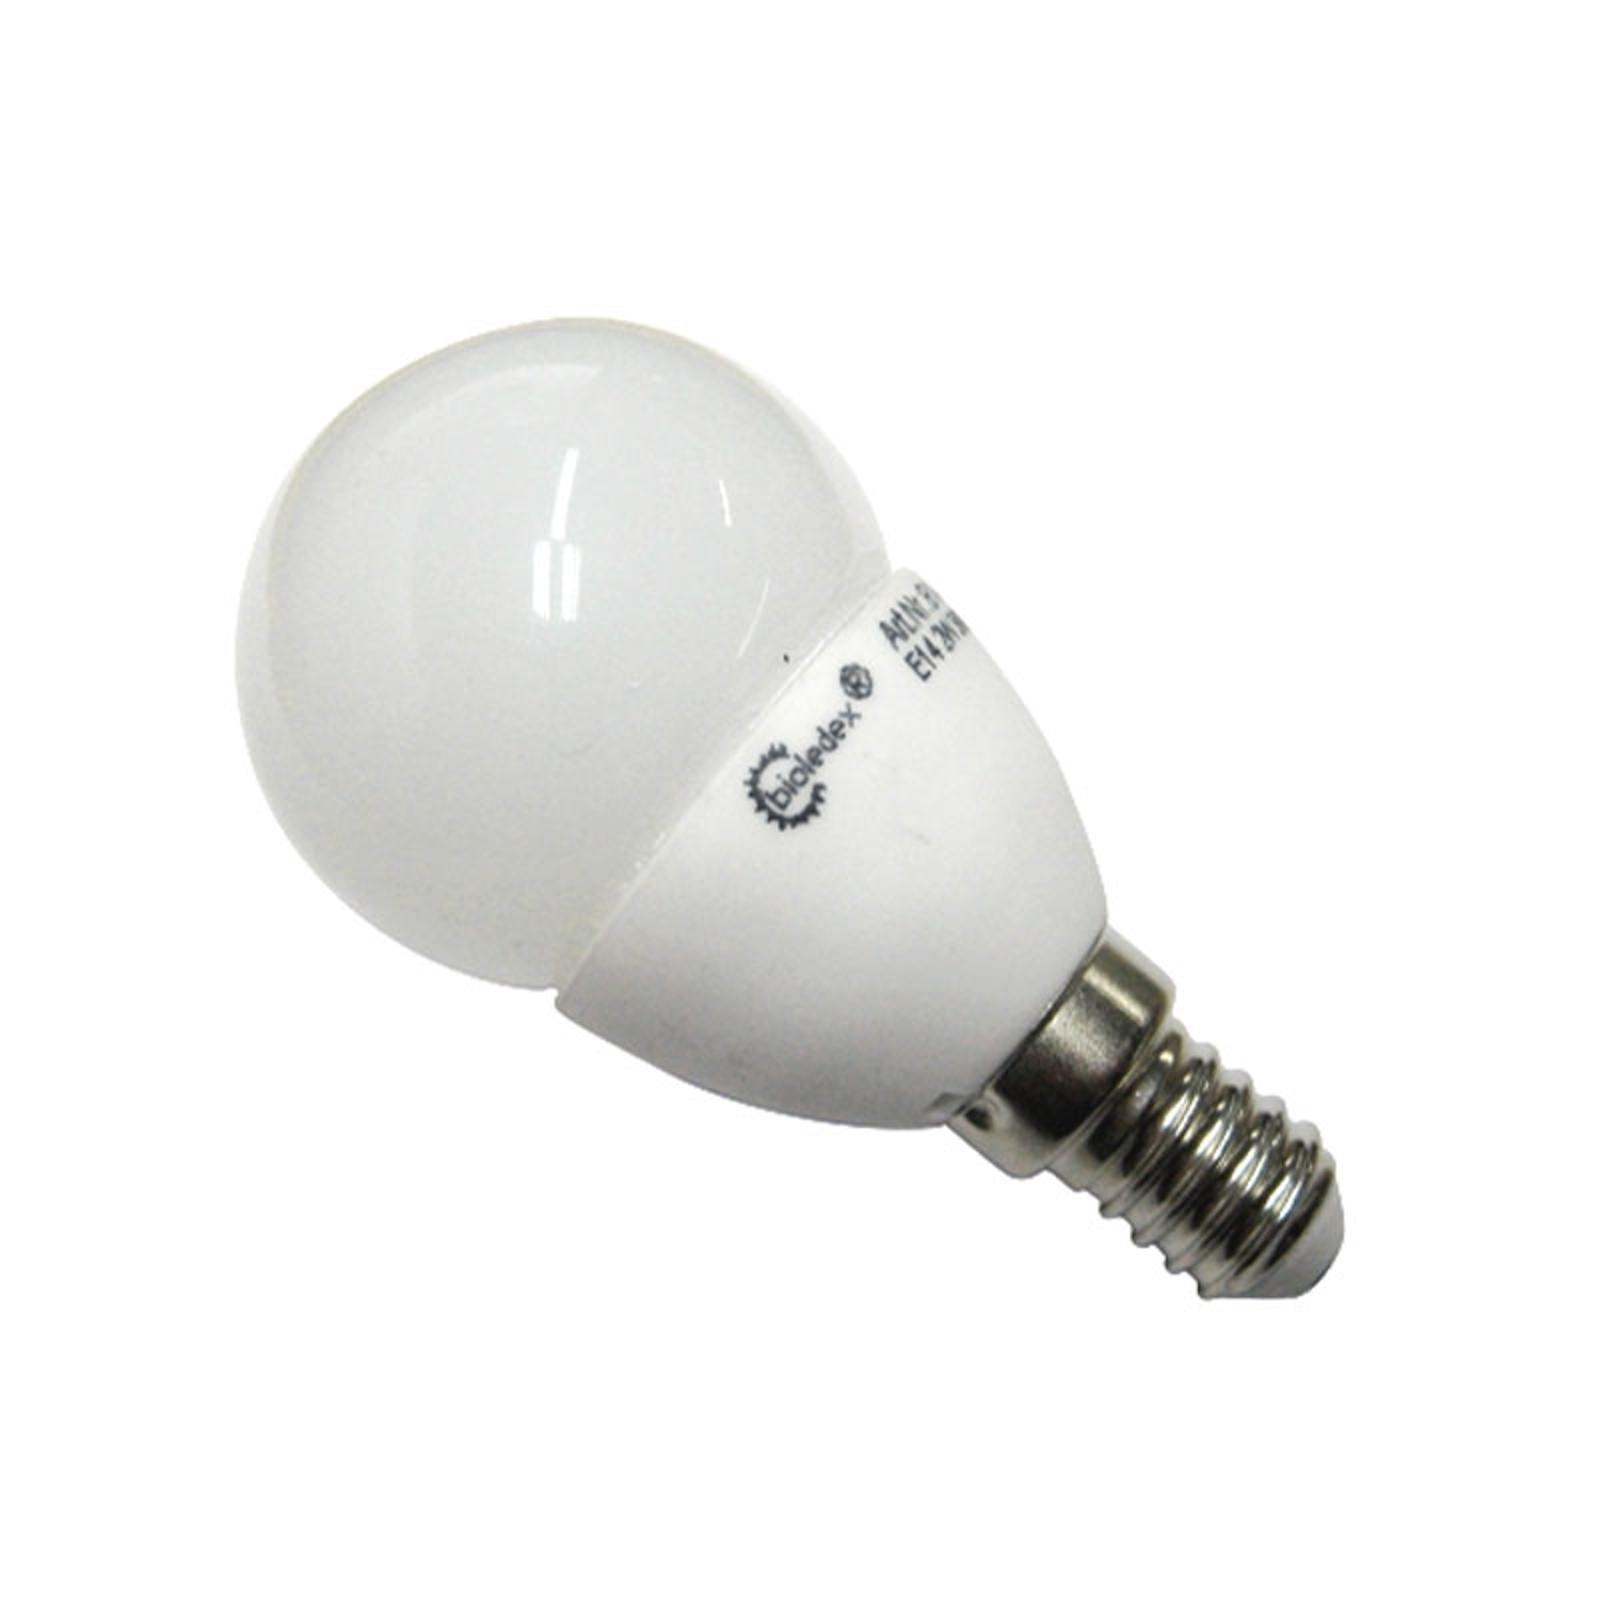 E14-ledlamp Tema in gloeilampvorm, 3W